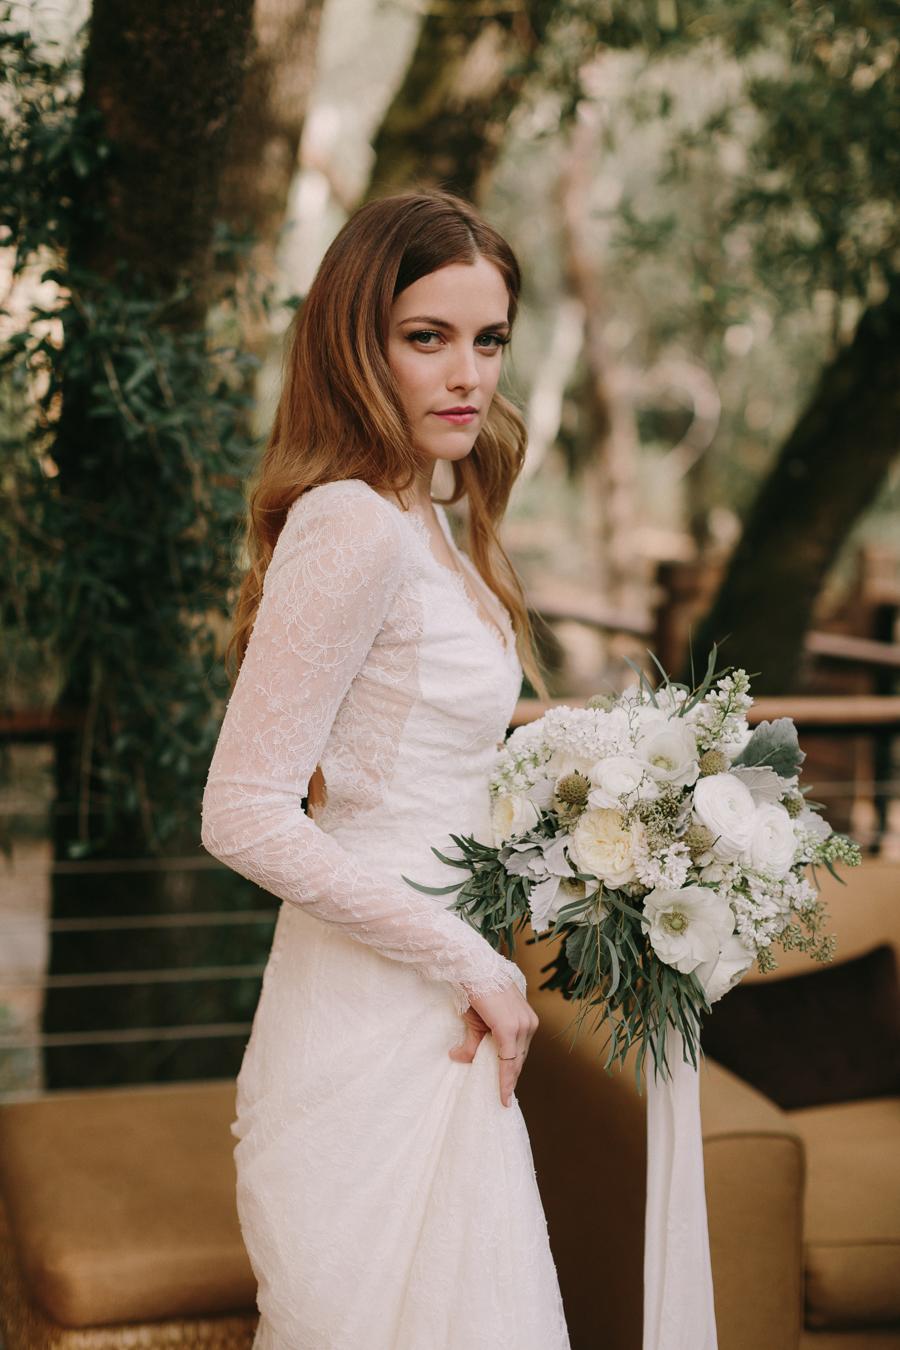 Riley Keough in her wedding dress